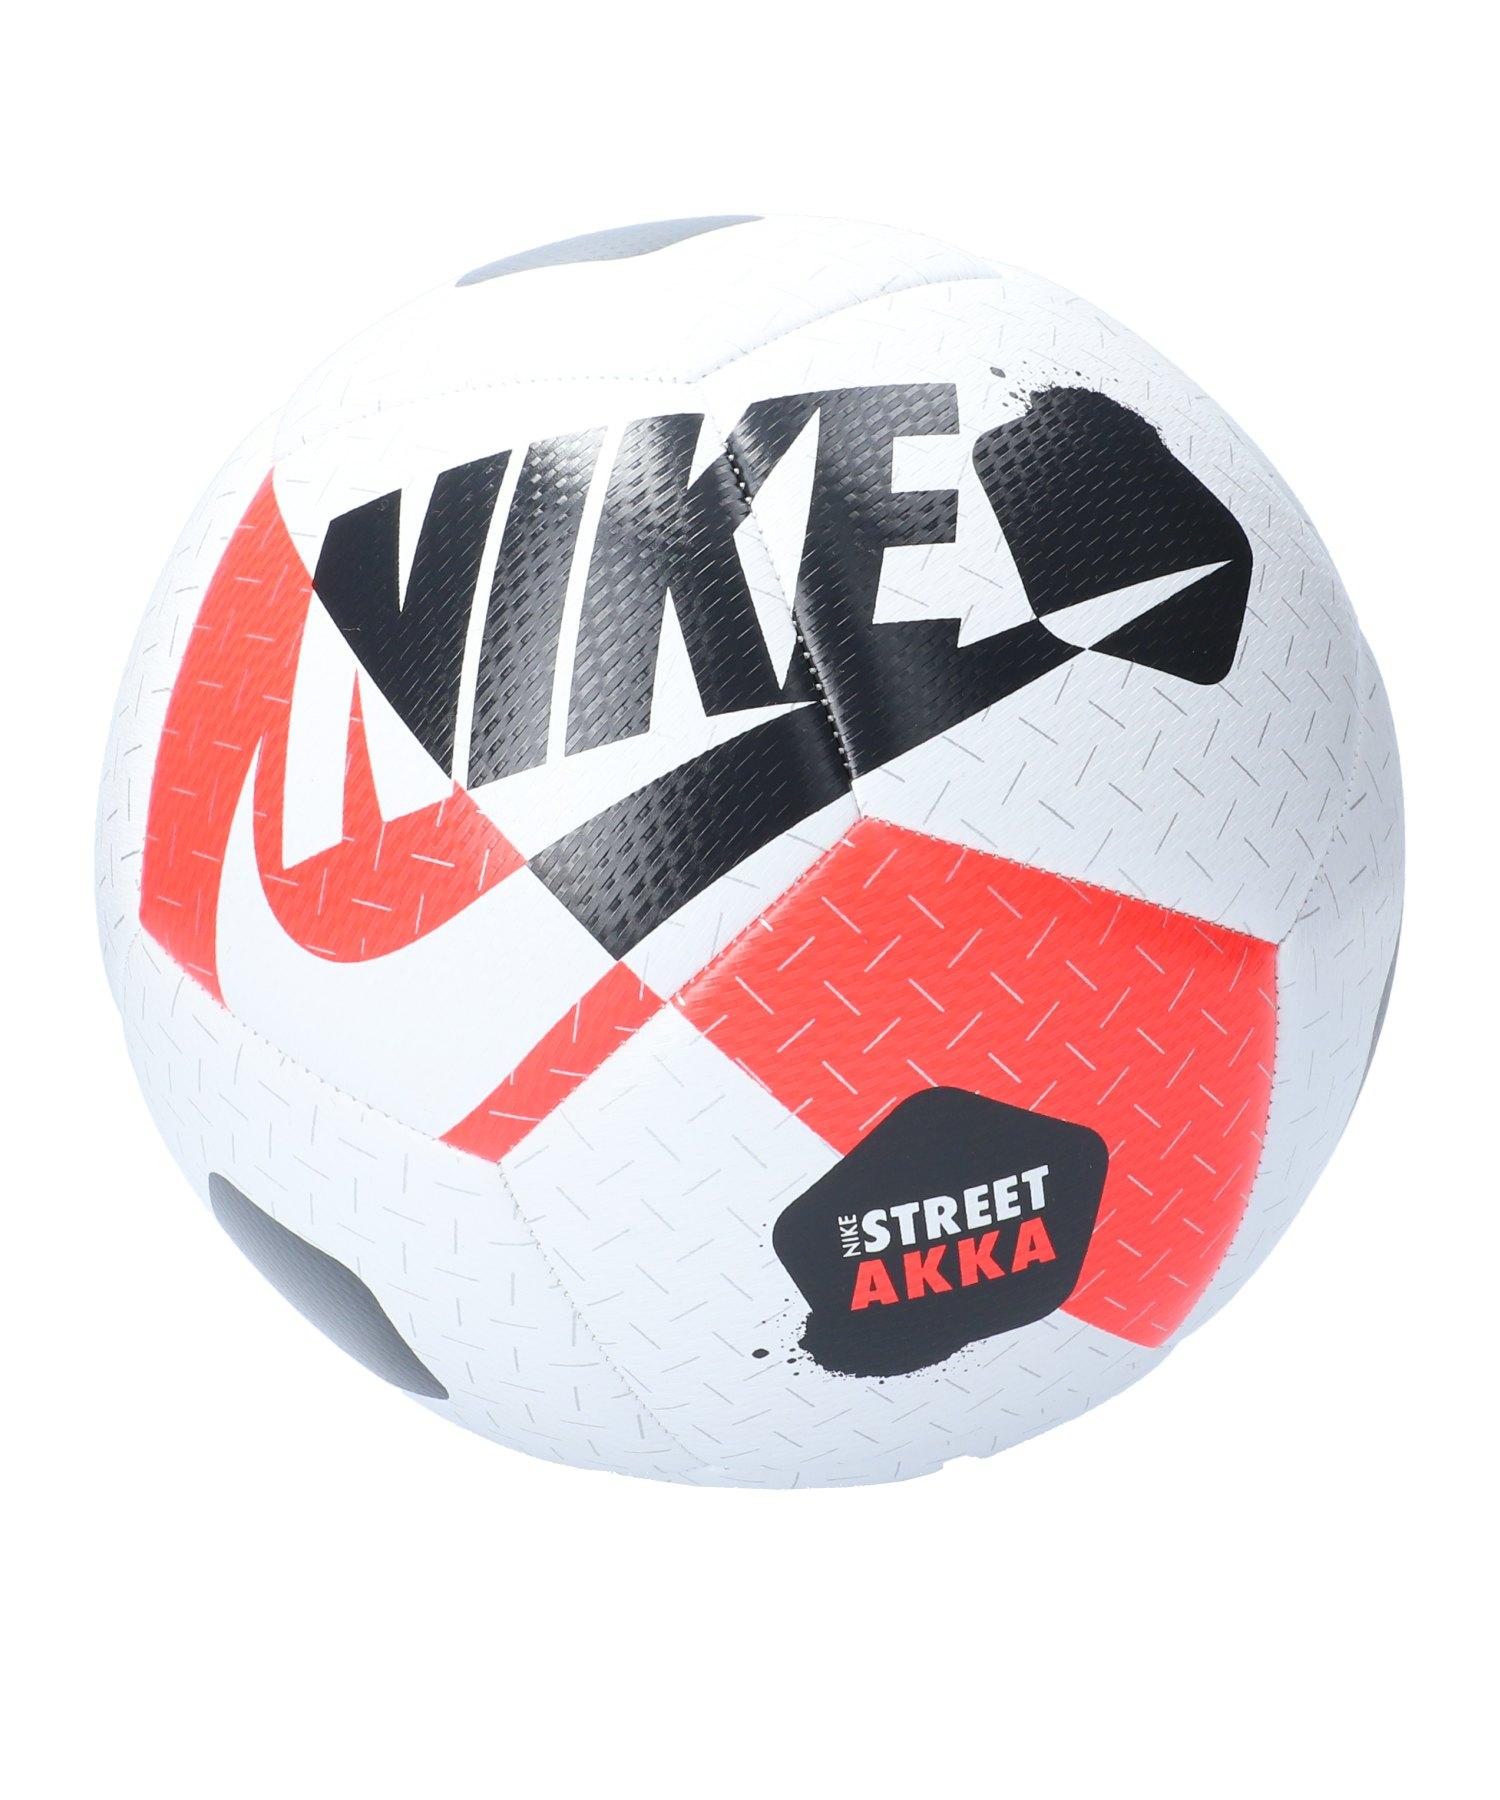 Nike Street Akka Trainingsball Weiss Rot F101 - weiss